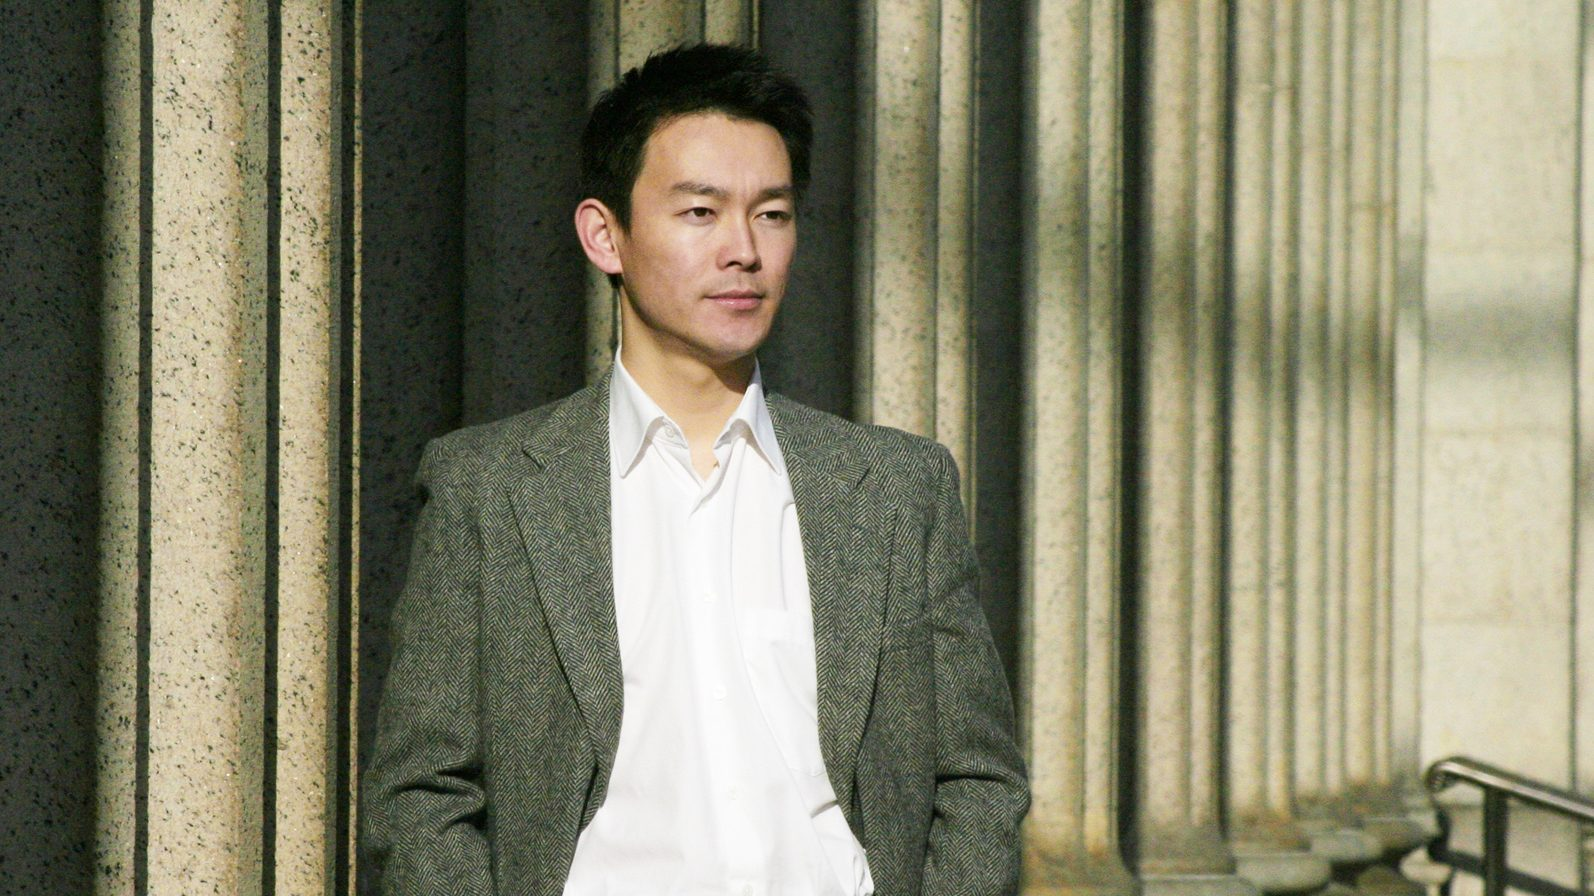 Chinese actor Ryan Jiang